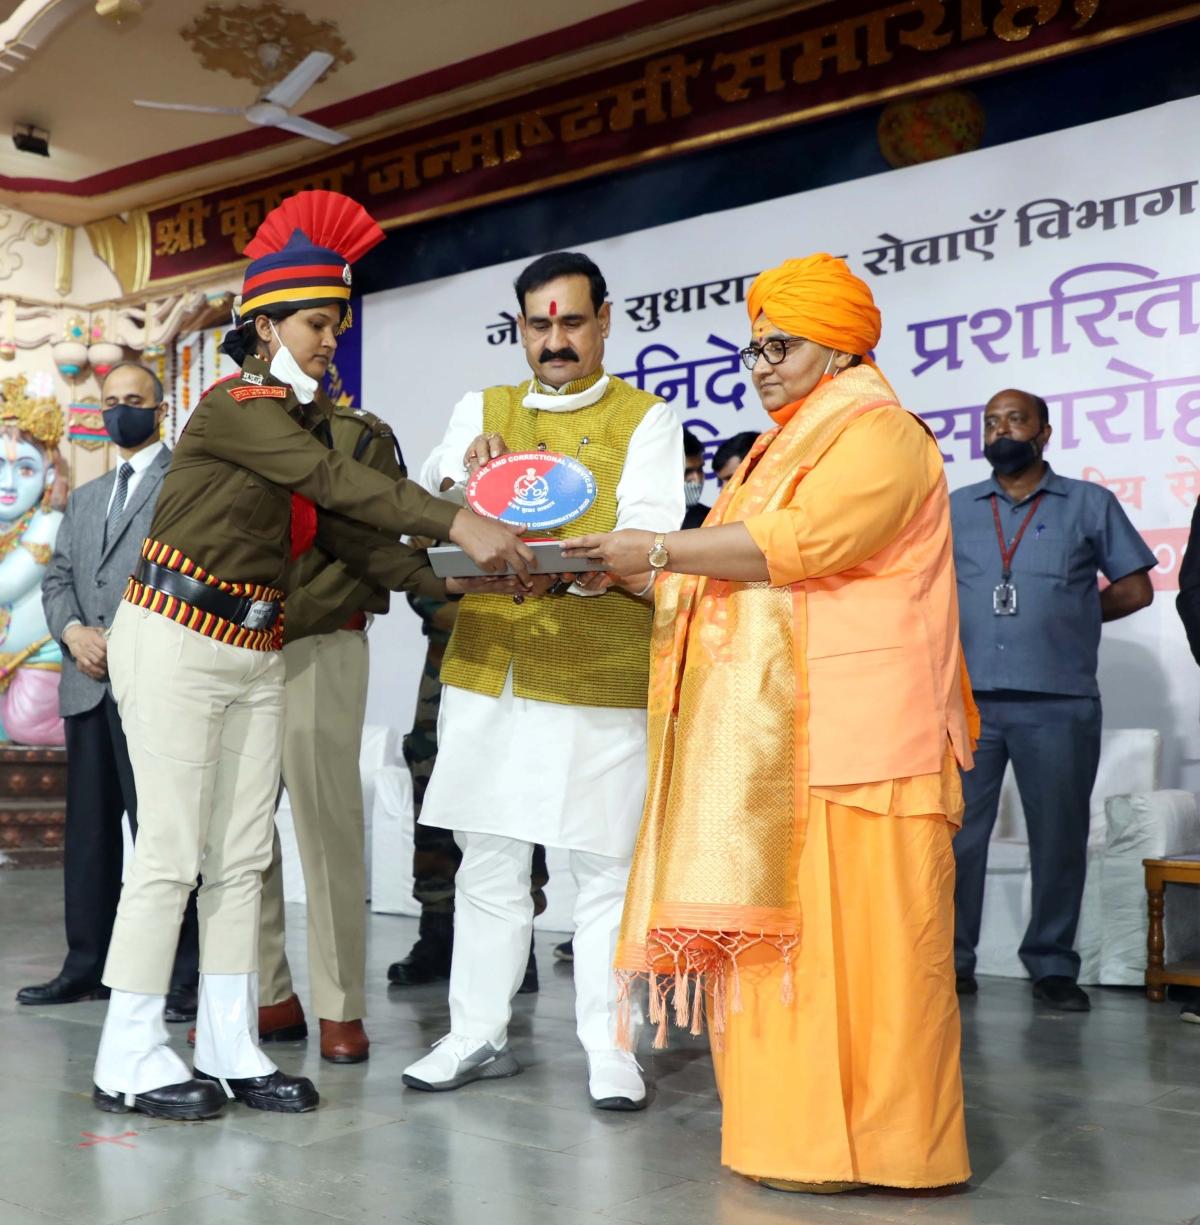 Madhya Pradesh Home and Jail minister Narottam Mishra felicitates a police officer.